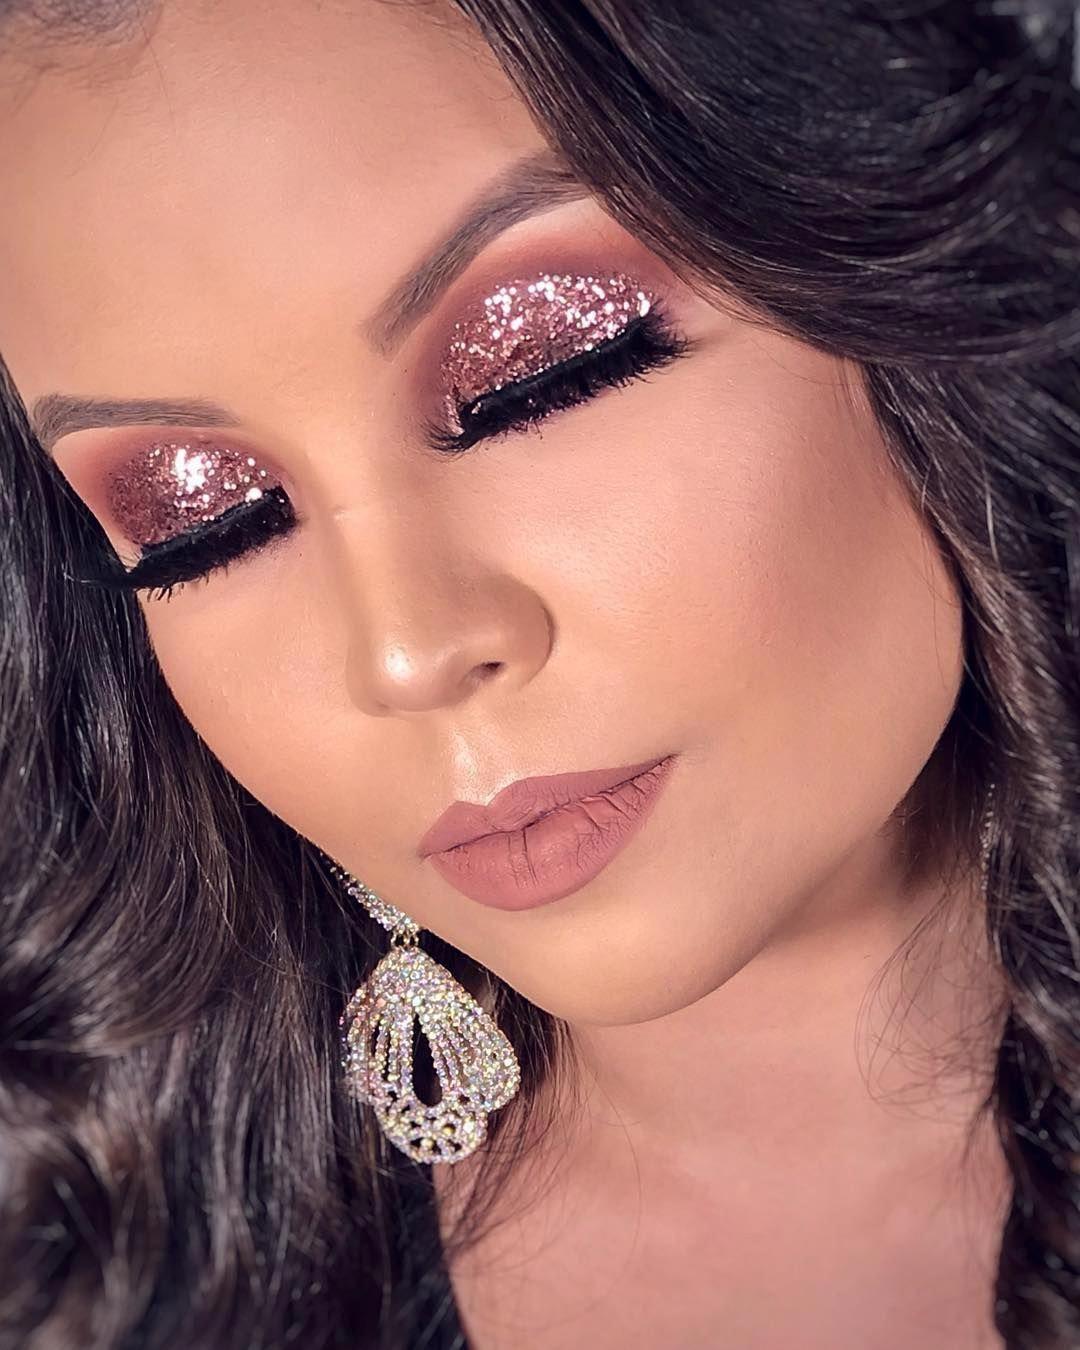 Stunning makeup for teens.